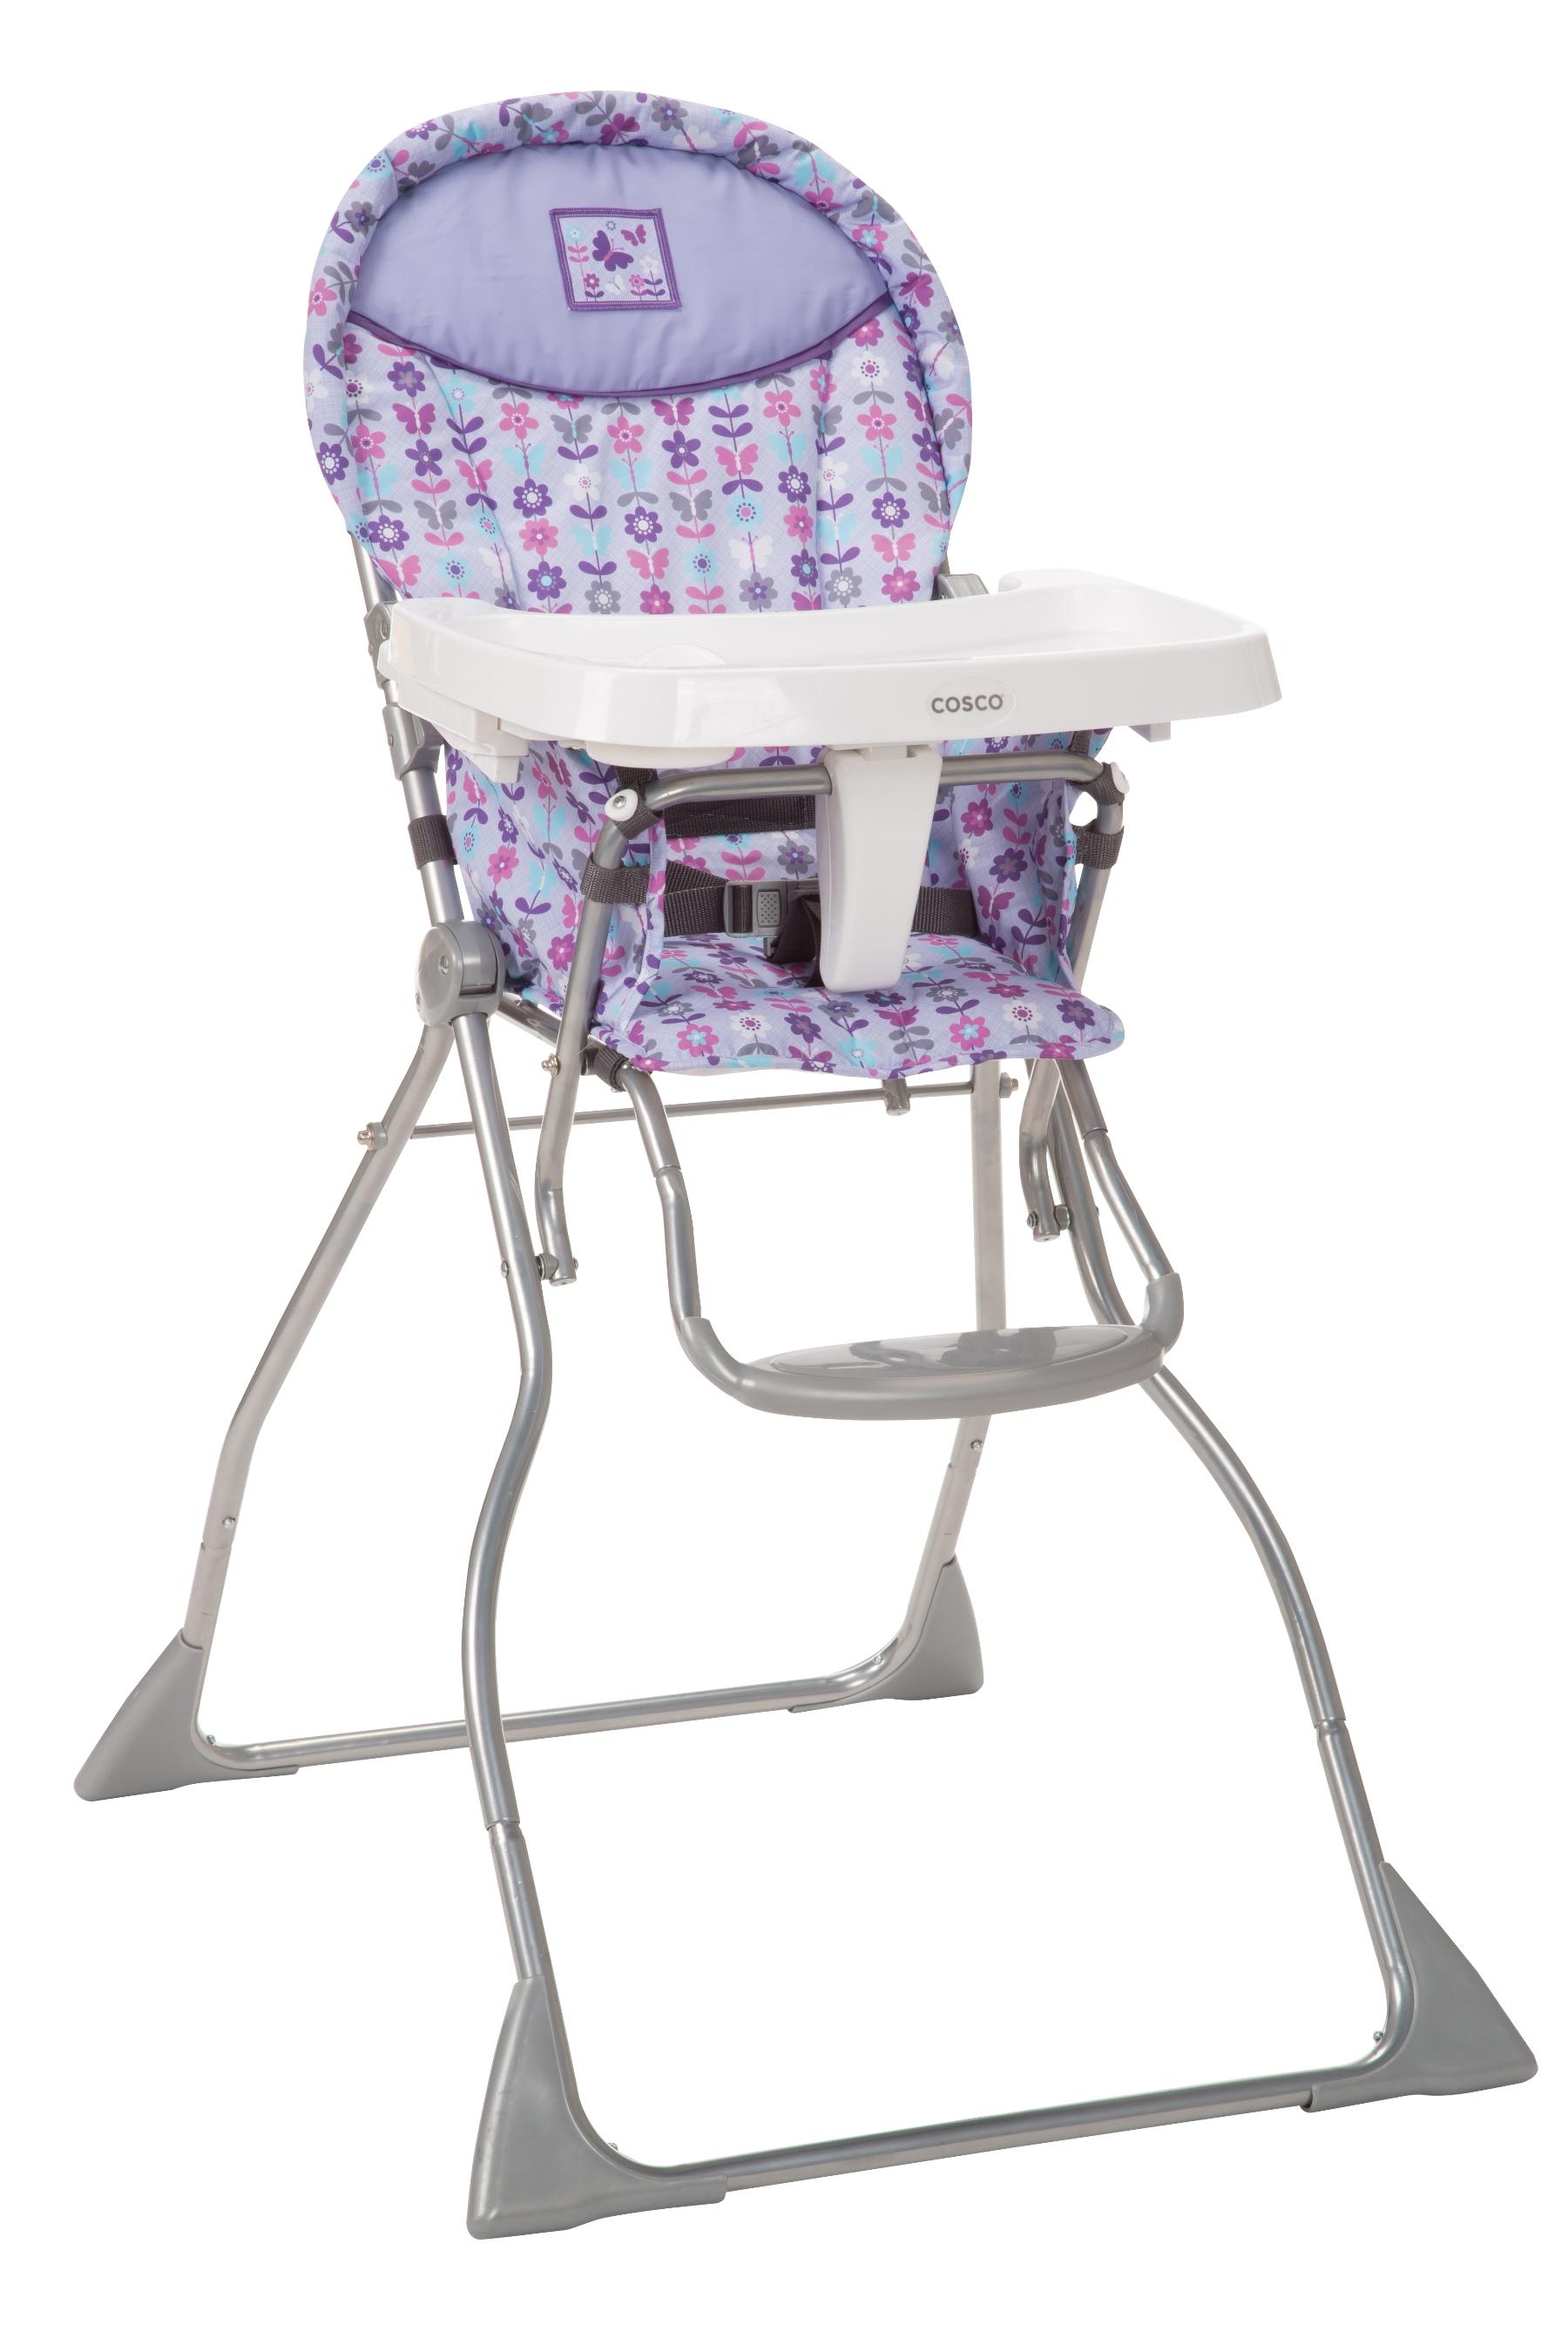 Cosco Slim Fold High Chair - Marissa